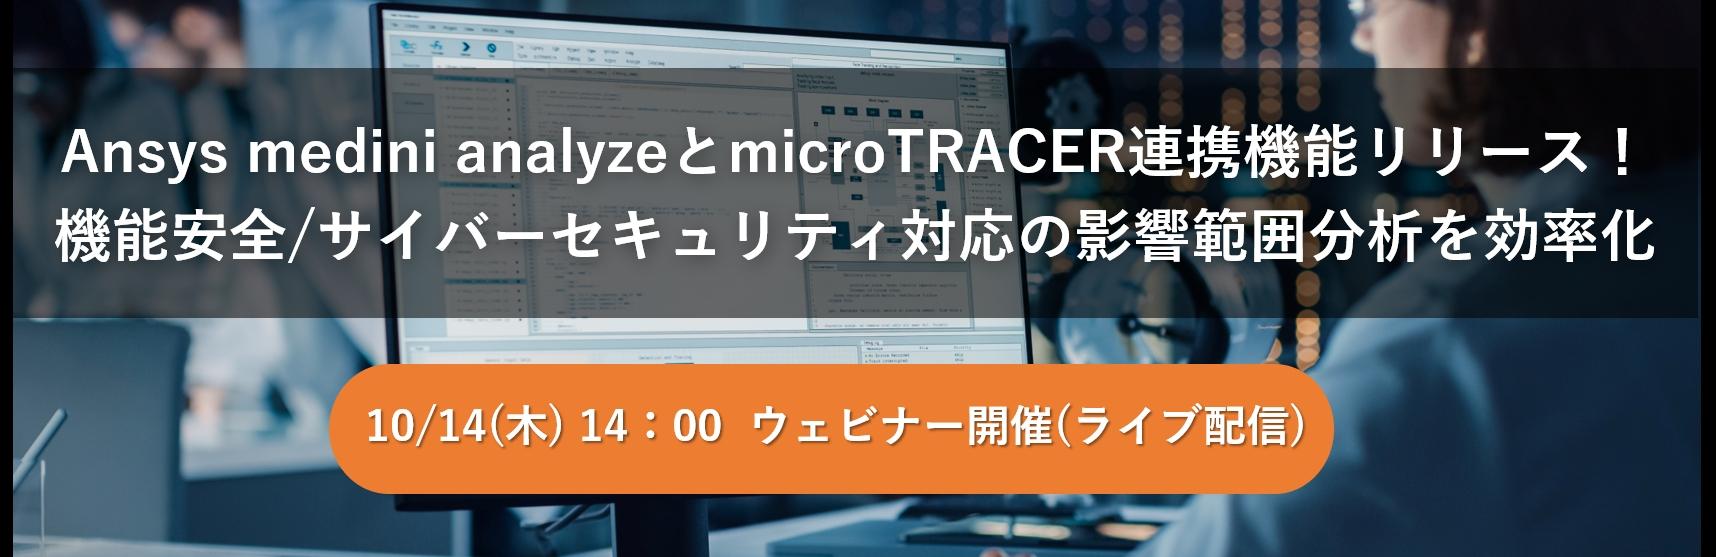 【Web】Ansys medini analyzeとmicroTRACER連携機能リリース!機能安全/サイバーセキュリティ対応の影響範囲分析を効率化